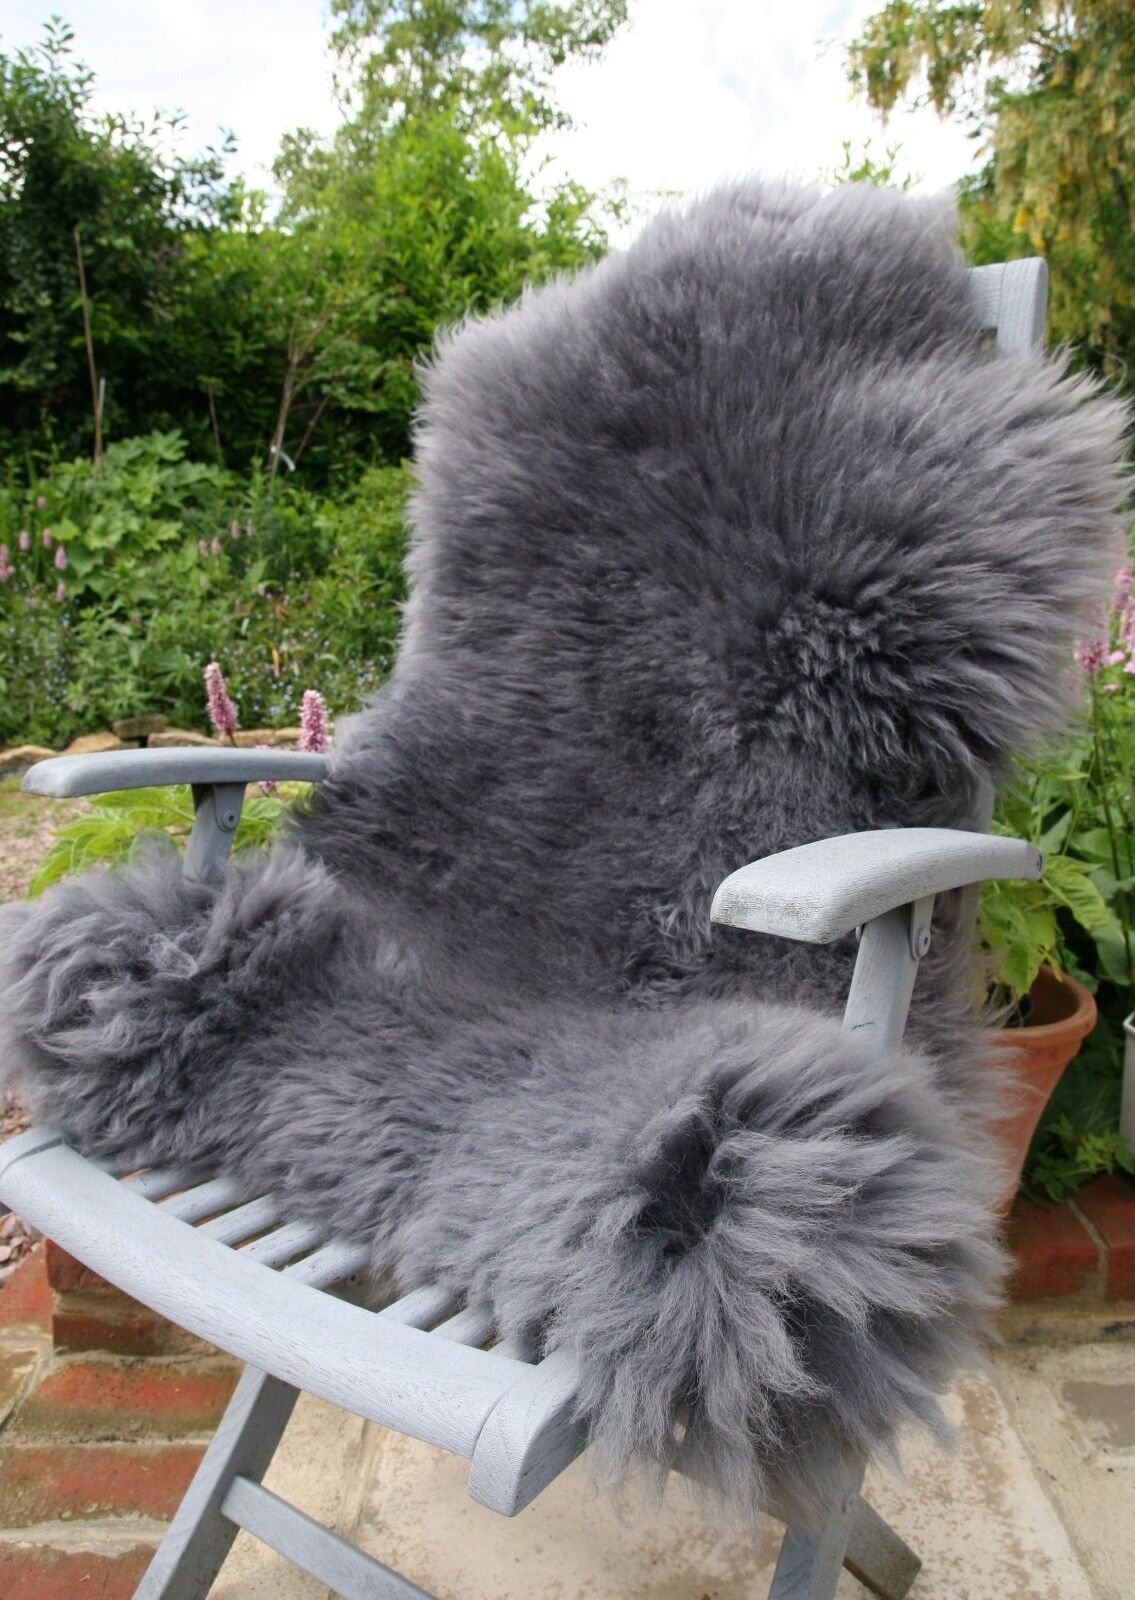 Sheepskin fur rug pelt skin skin skin leather hide 100%Natural fur made from British Sheep f34293